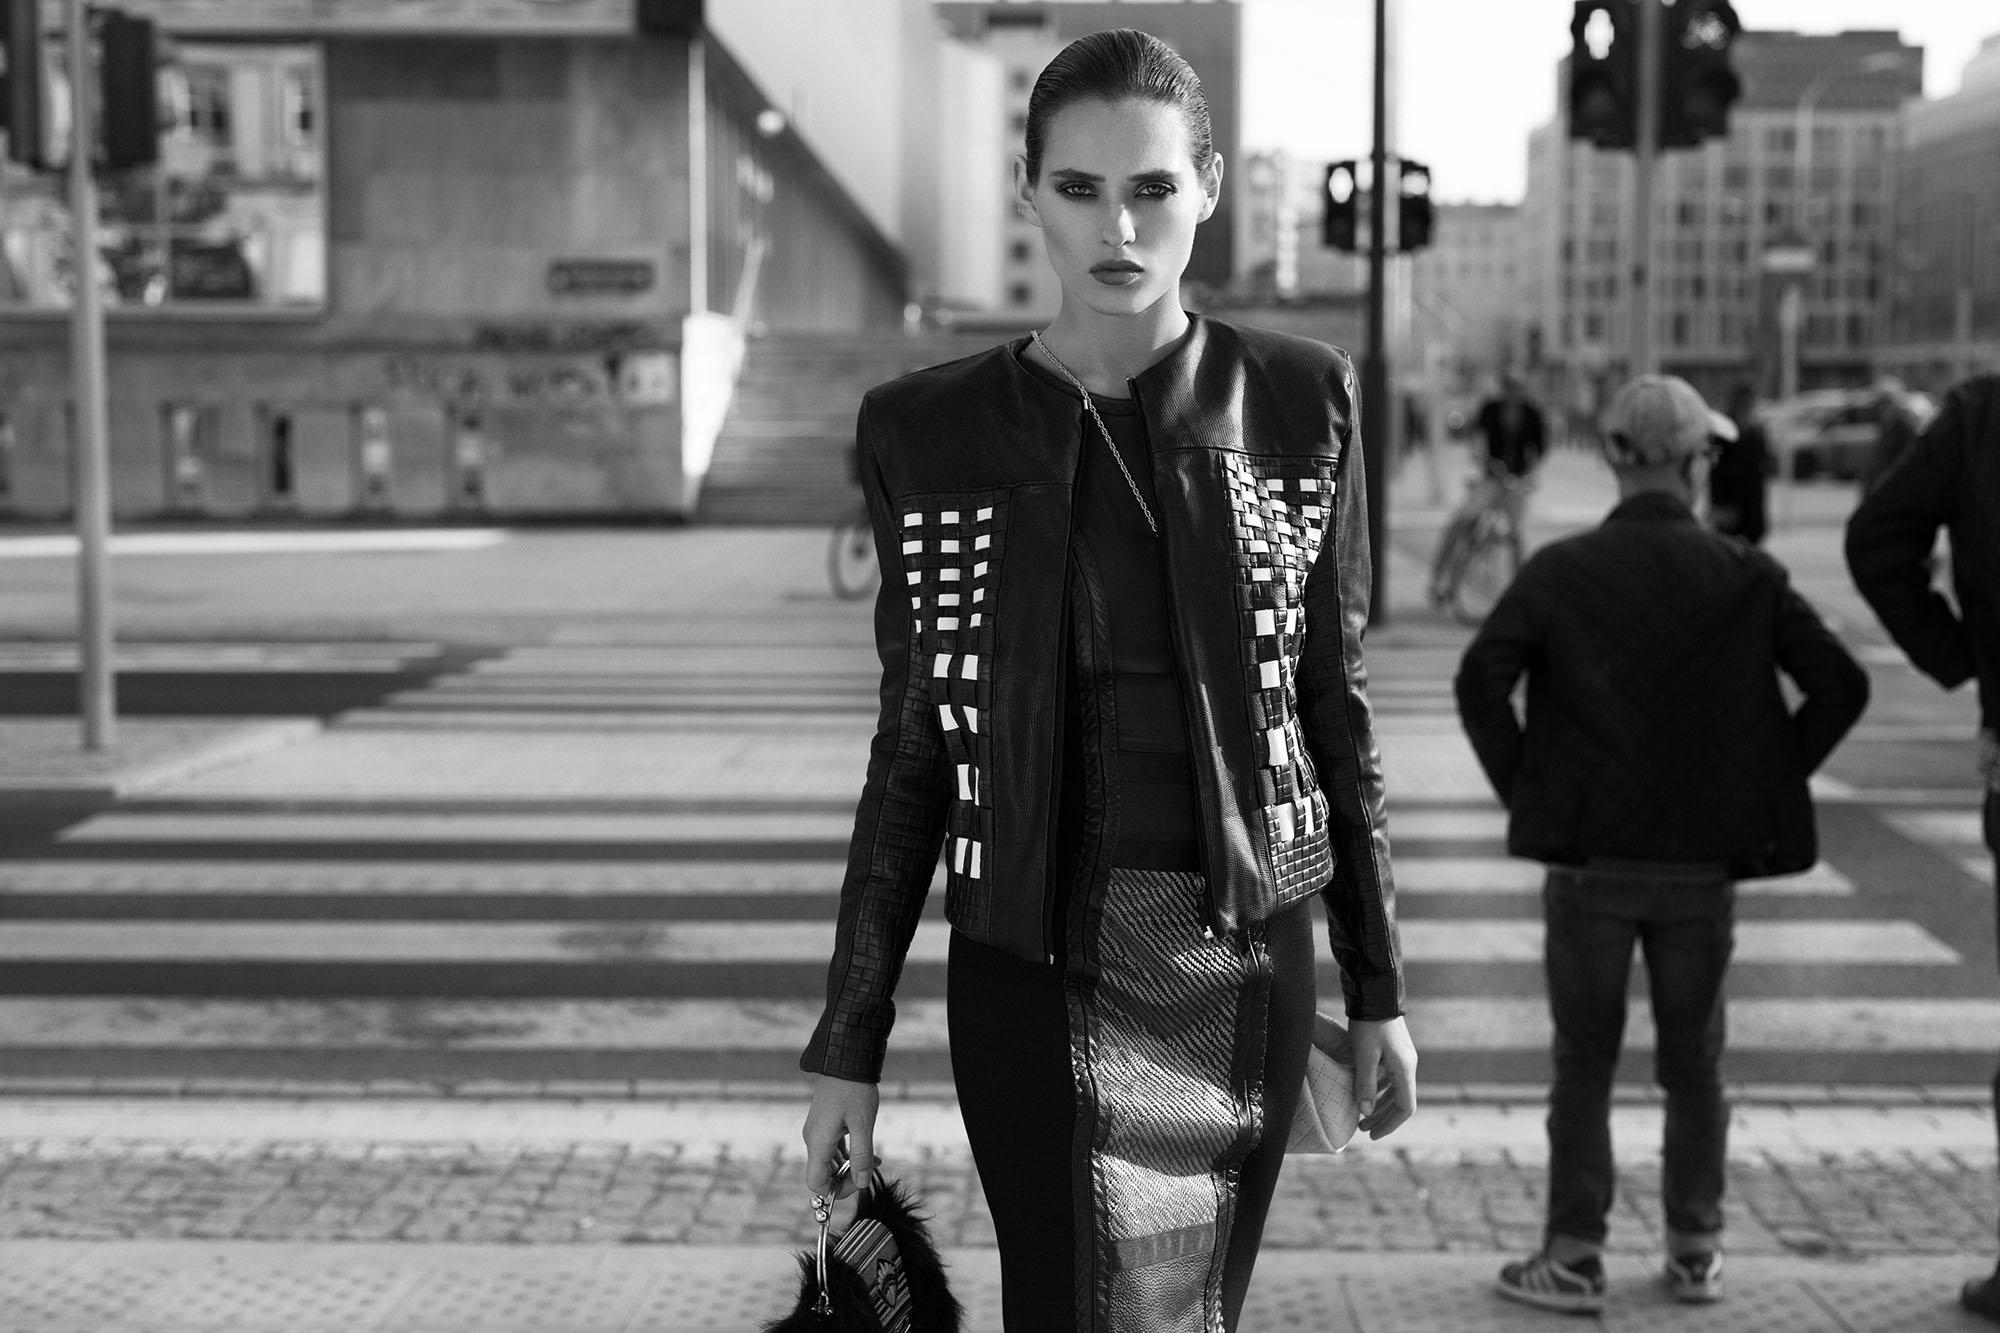 Fashion Creative Director and Photographer Warrent Satt